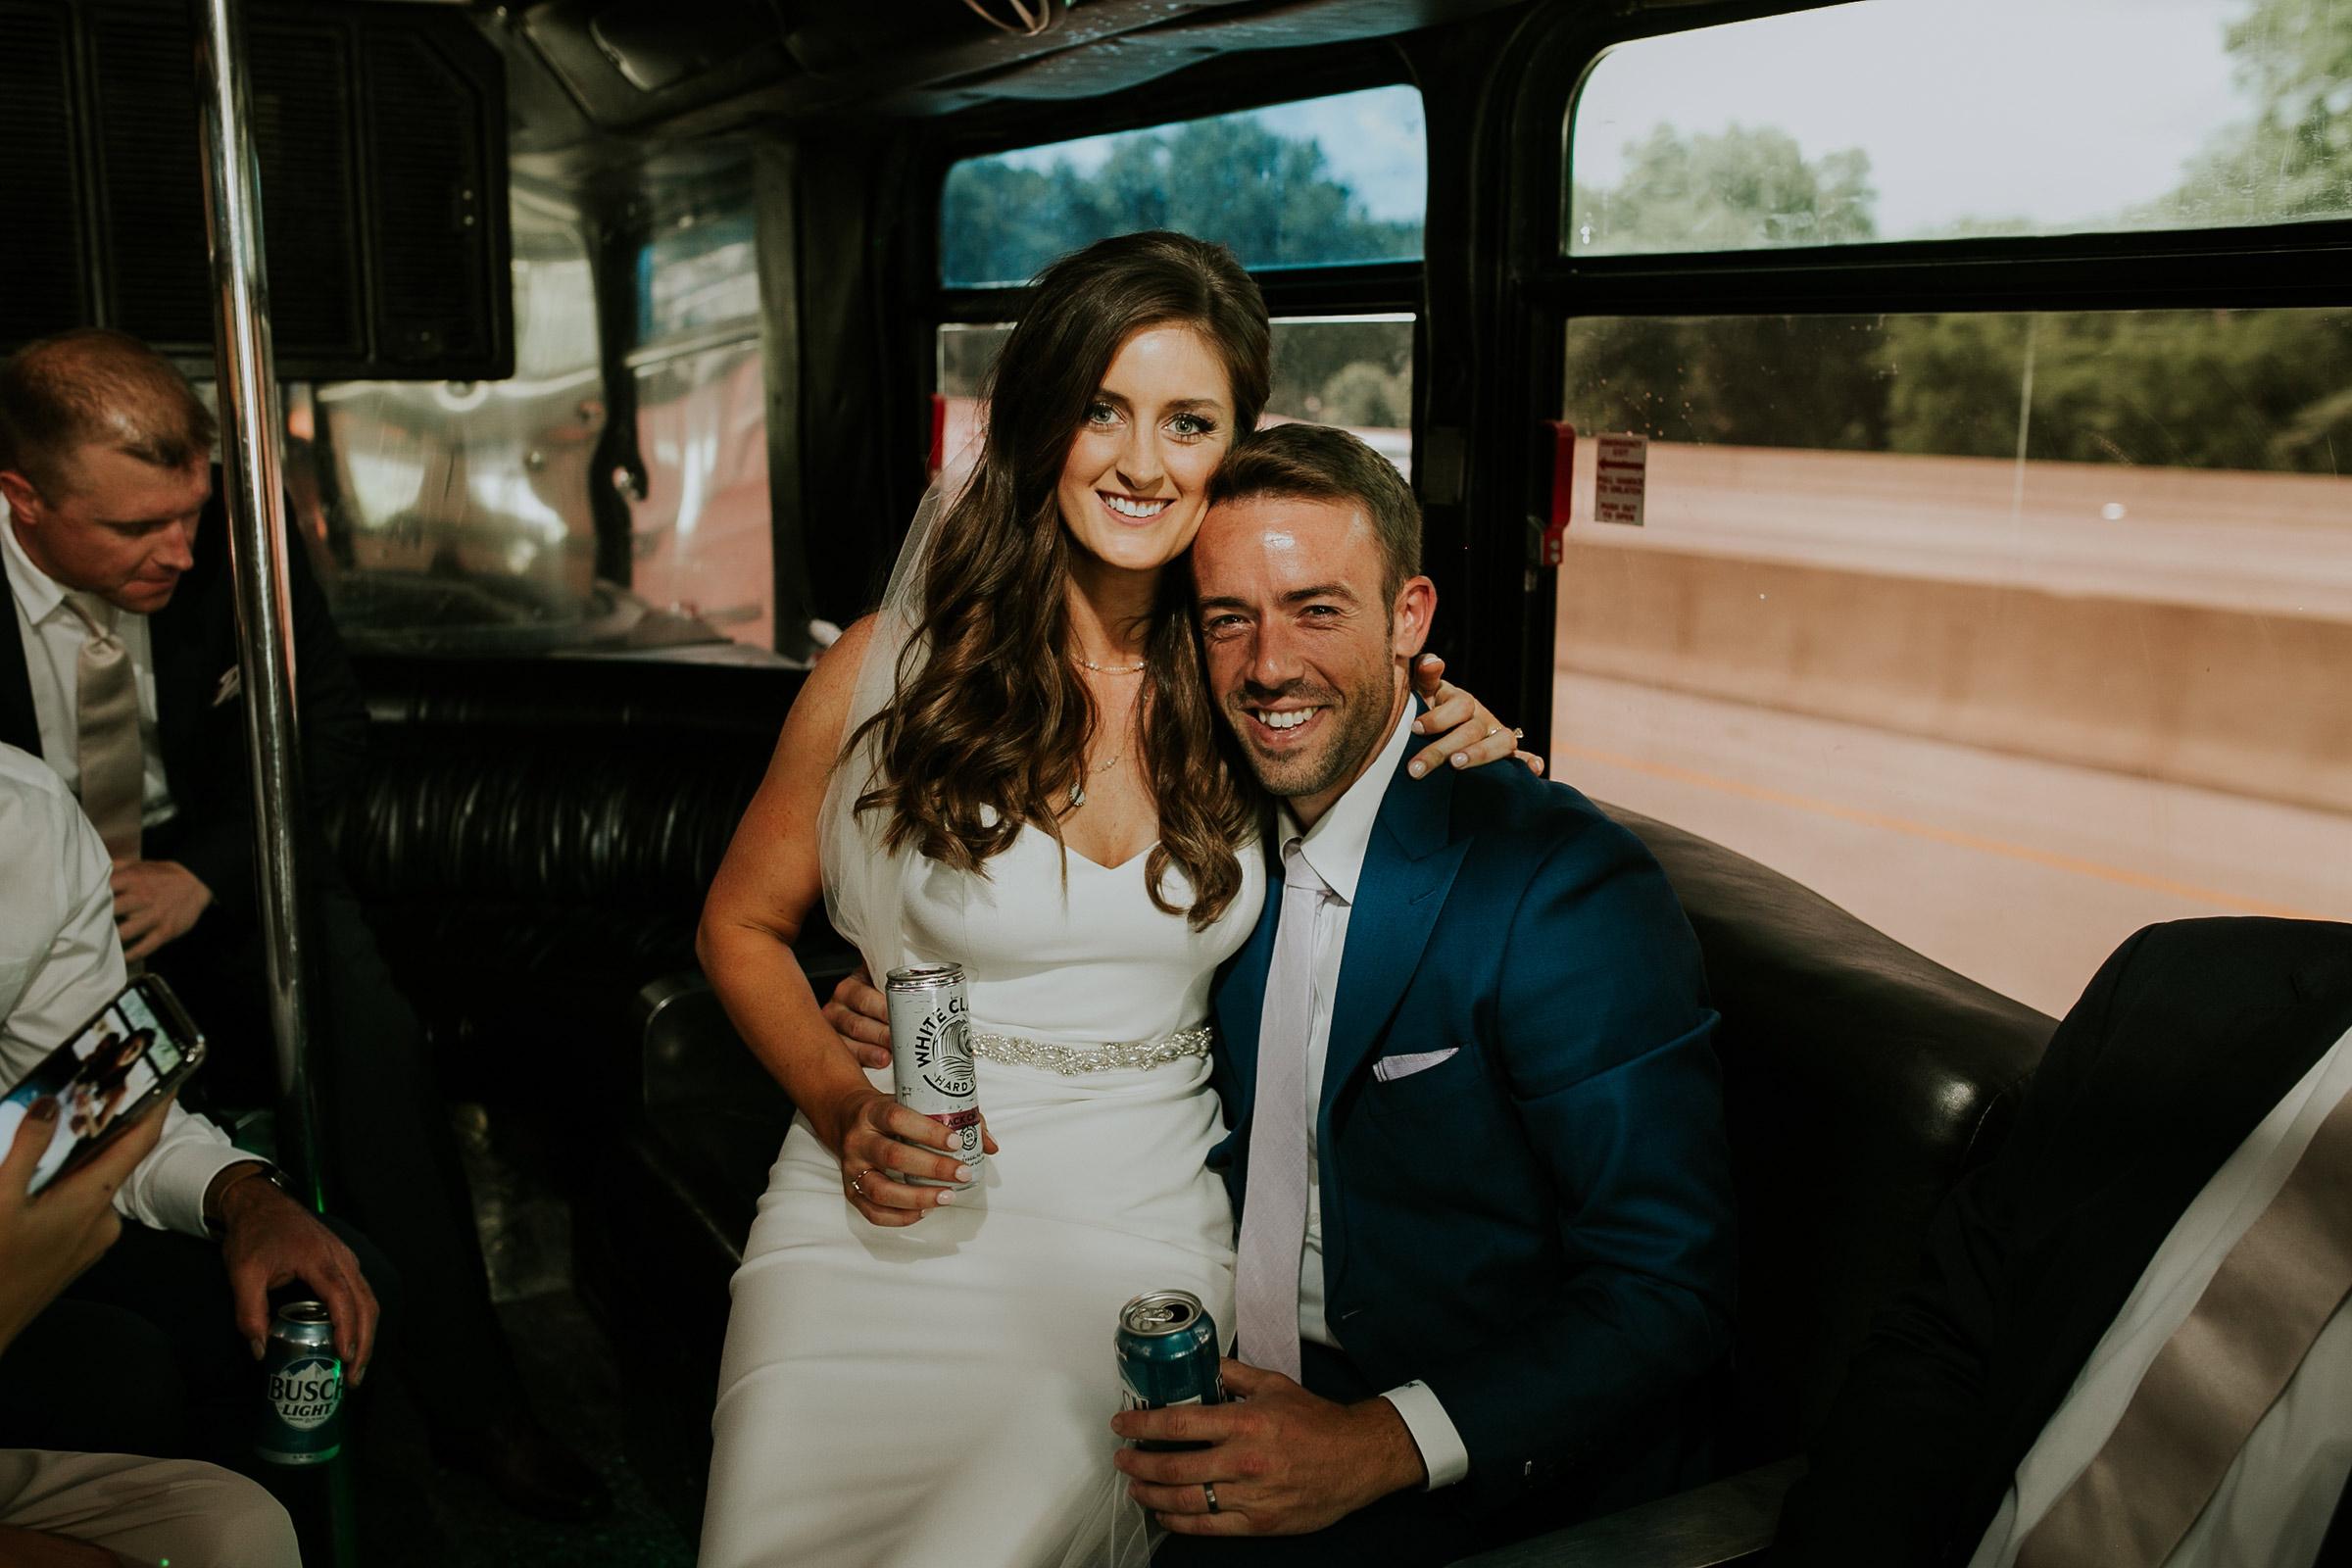 mr-mrs-hull-bride-groom-smile-bus-desmoines-iowa-raelyn-ramey-photography-390.jpg